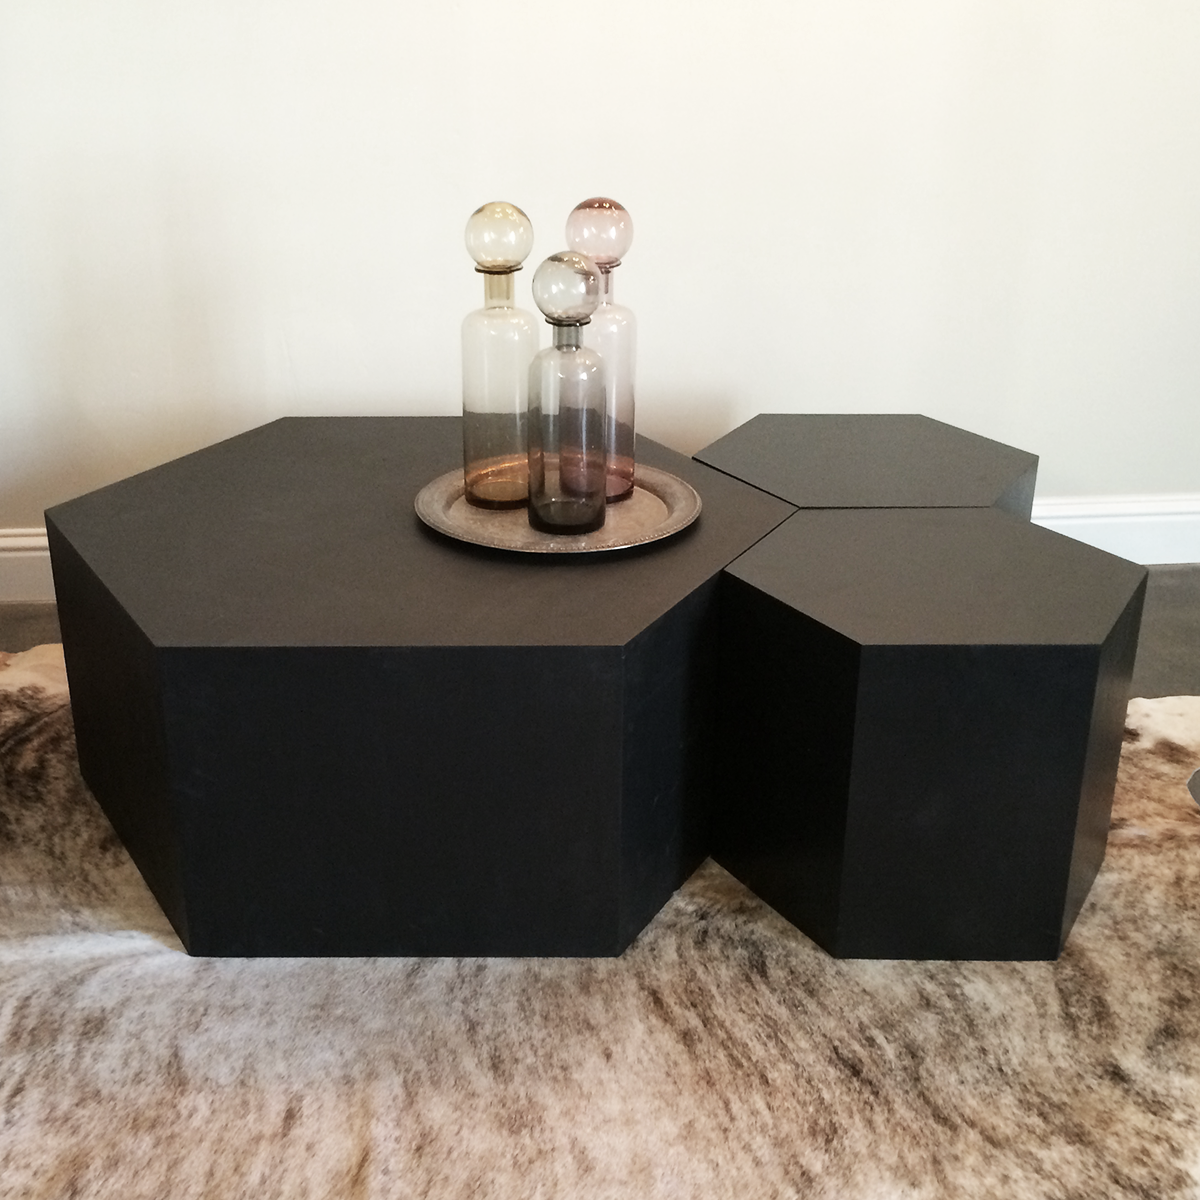 Hive wood modular honeycomb geometric table 20w x 16h each 399 retail